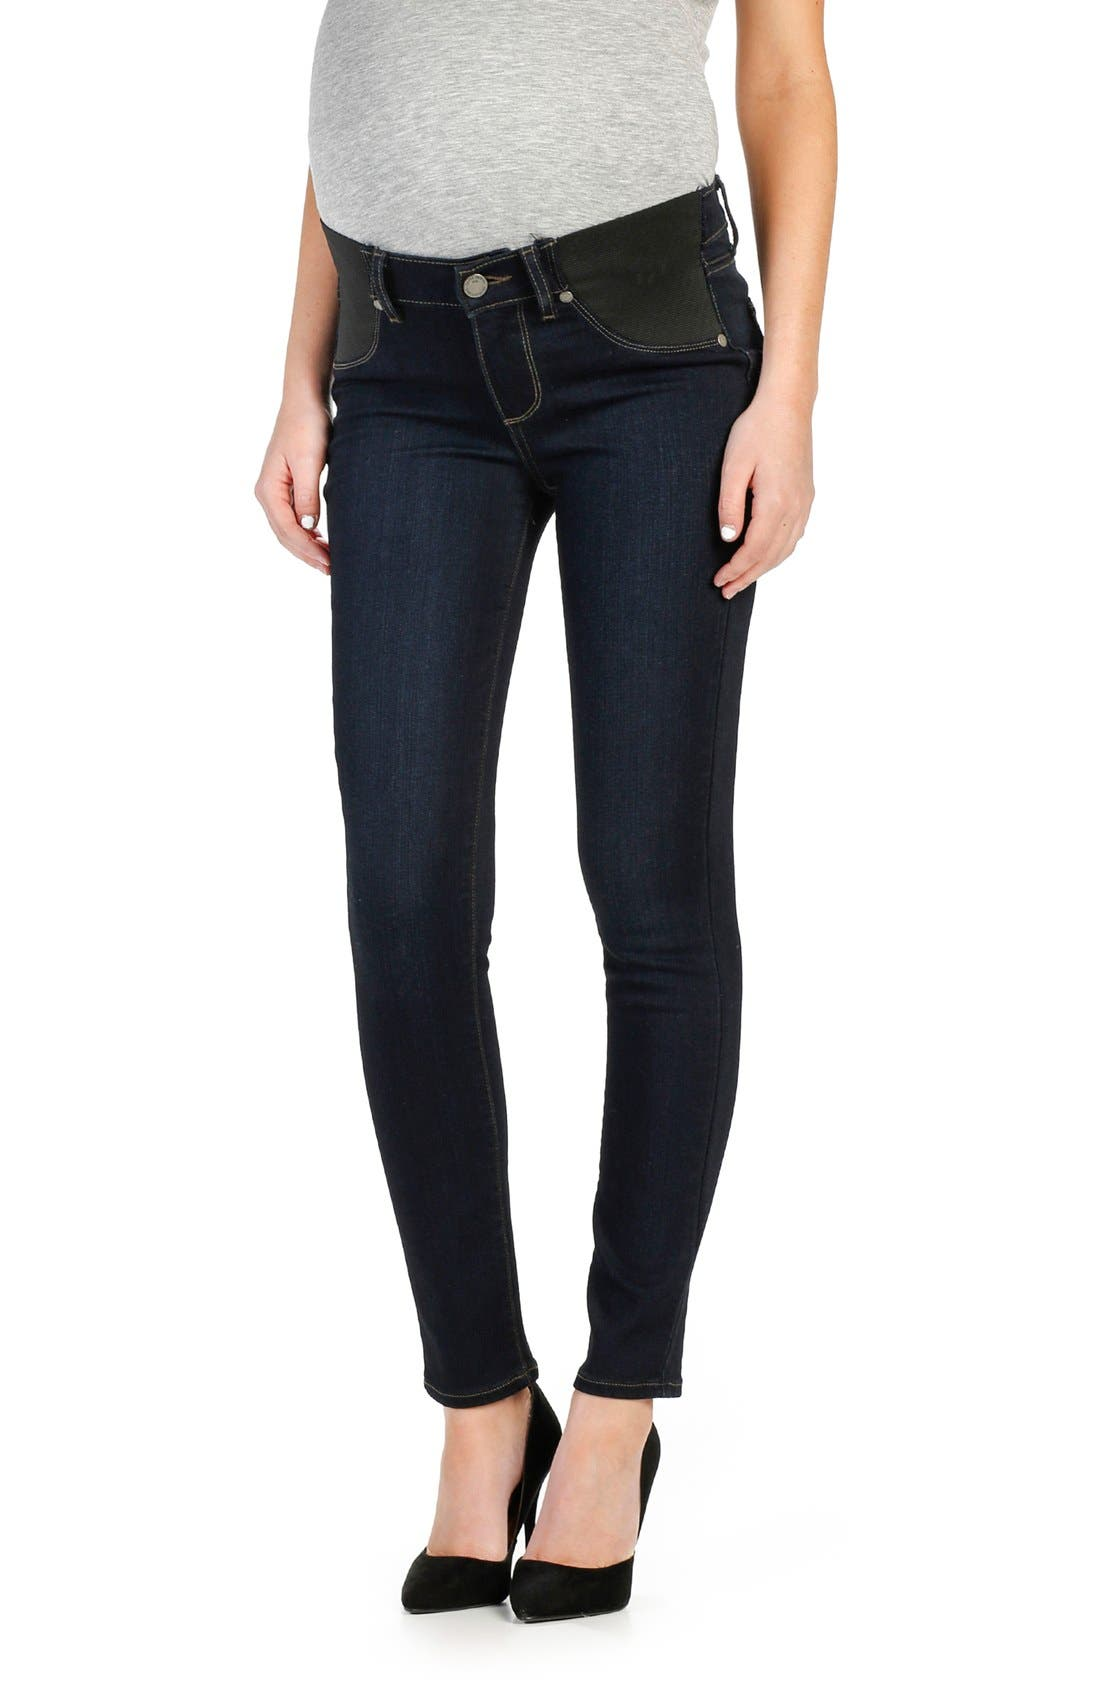 PAIGE Transcend - Verdugo Ankle Skinny Maternity Jeans (Mona)